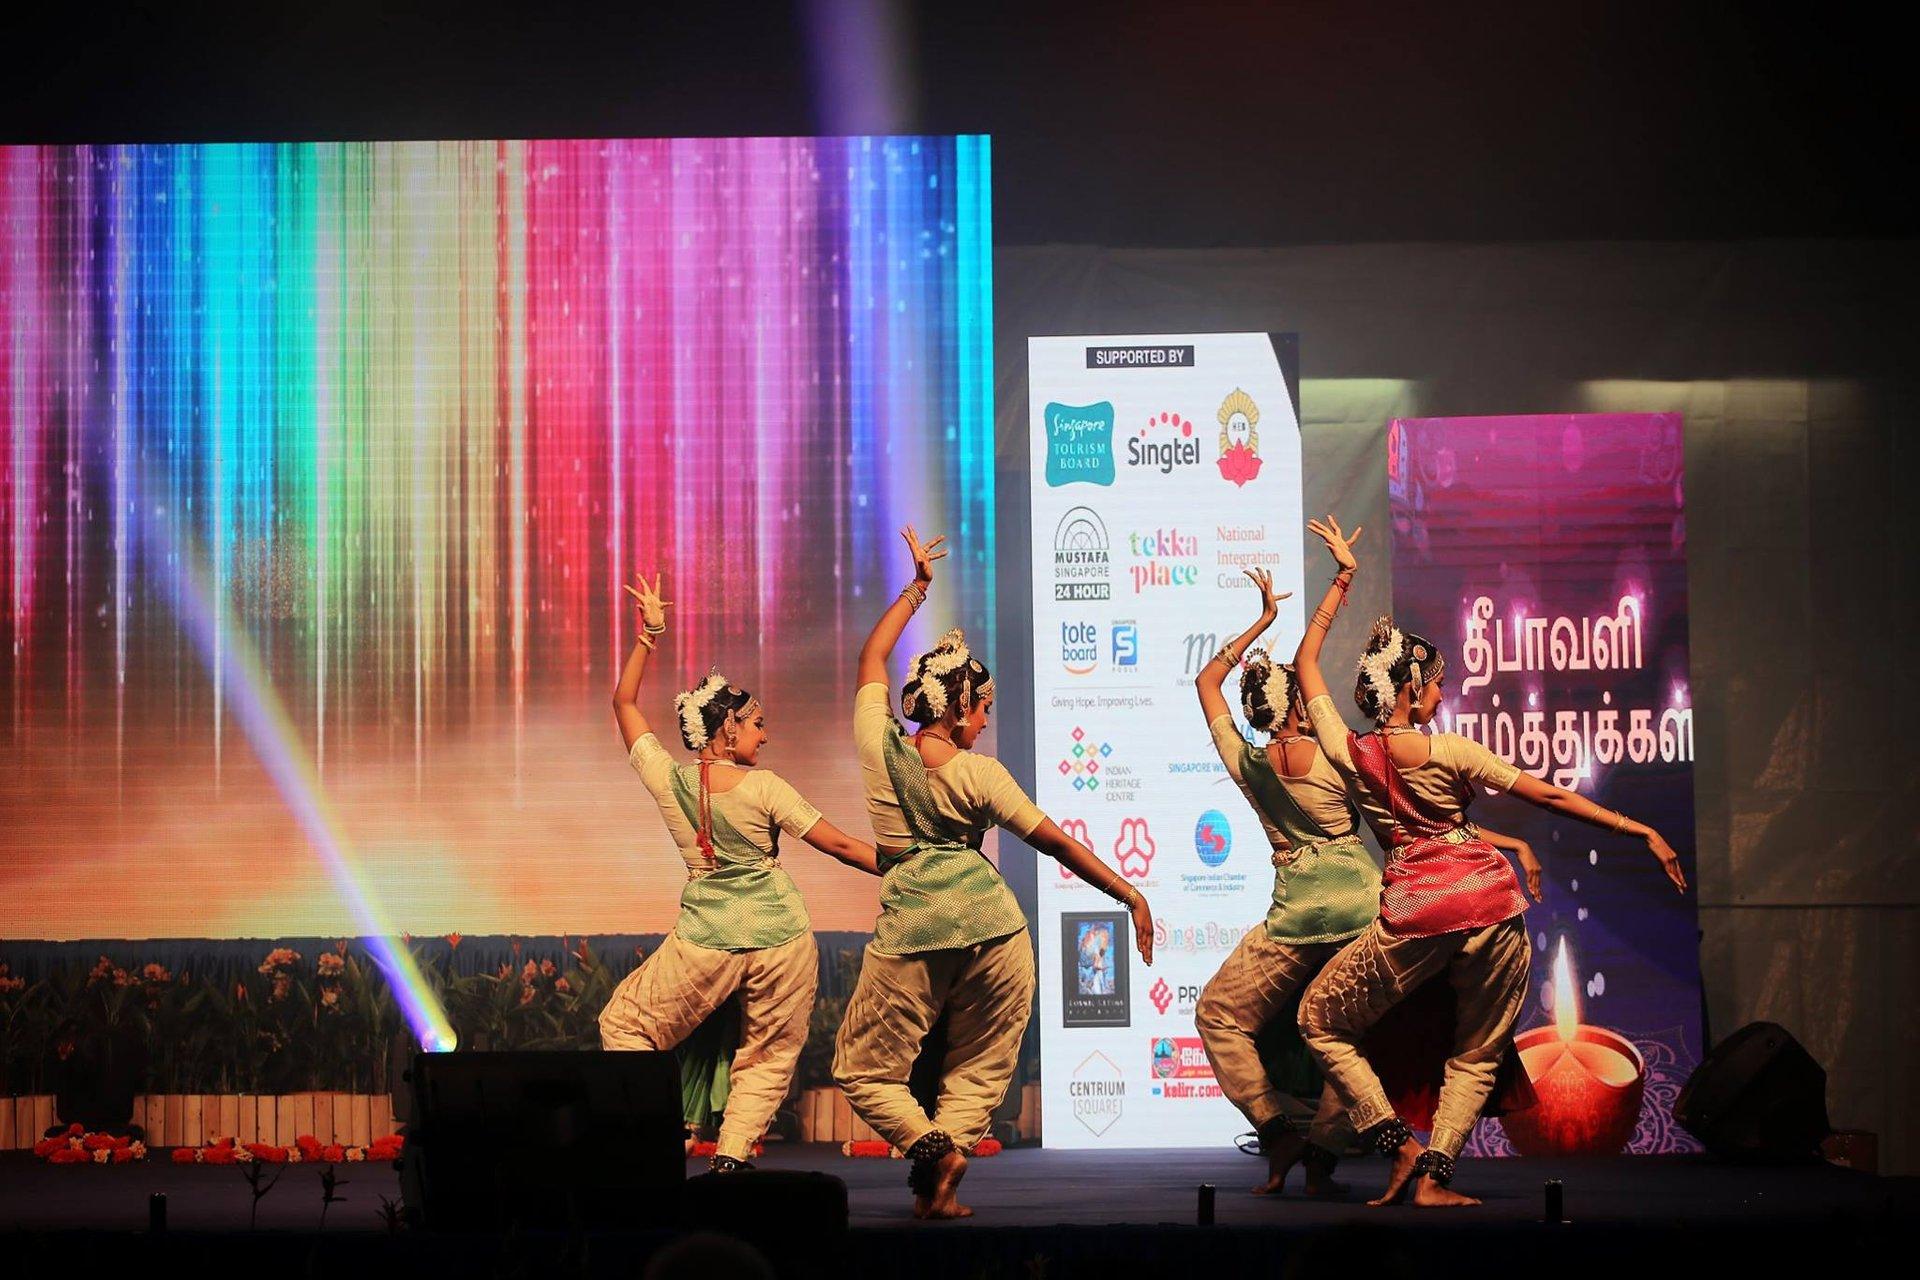 Deepavali Countdown Concert (Amarkala Deepavali) on Mackenzie Rd, Singapore 2020